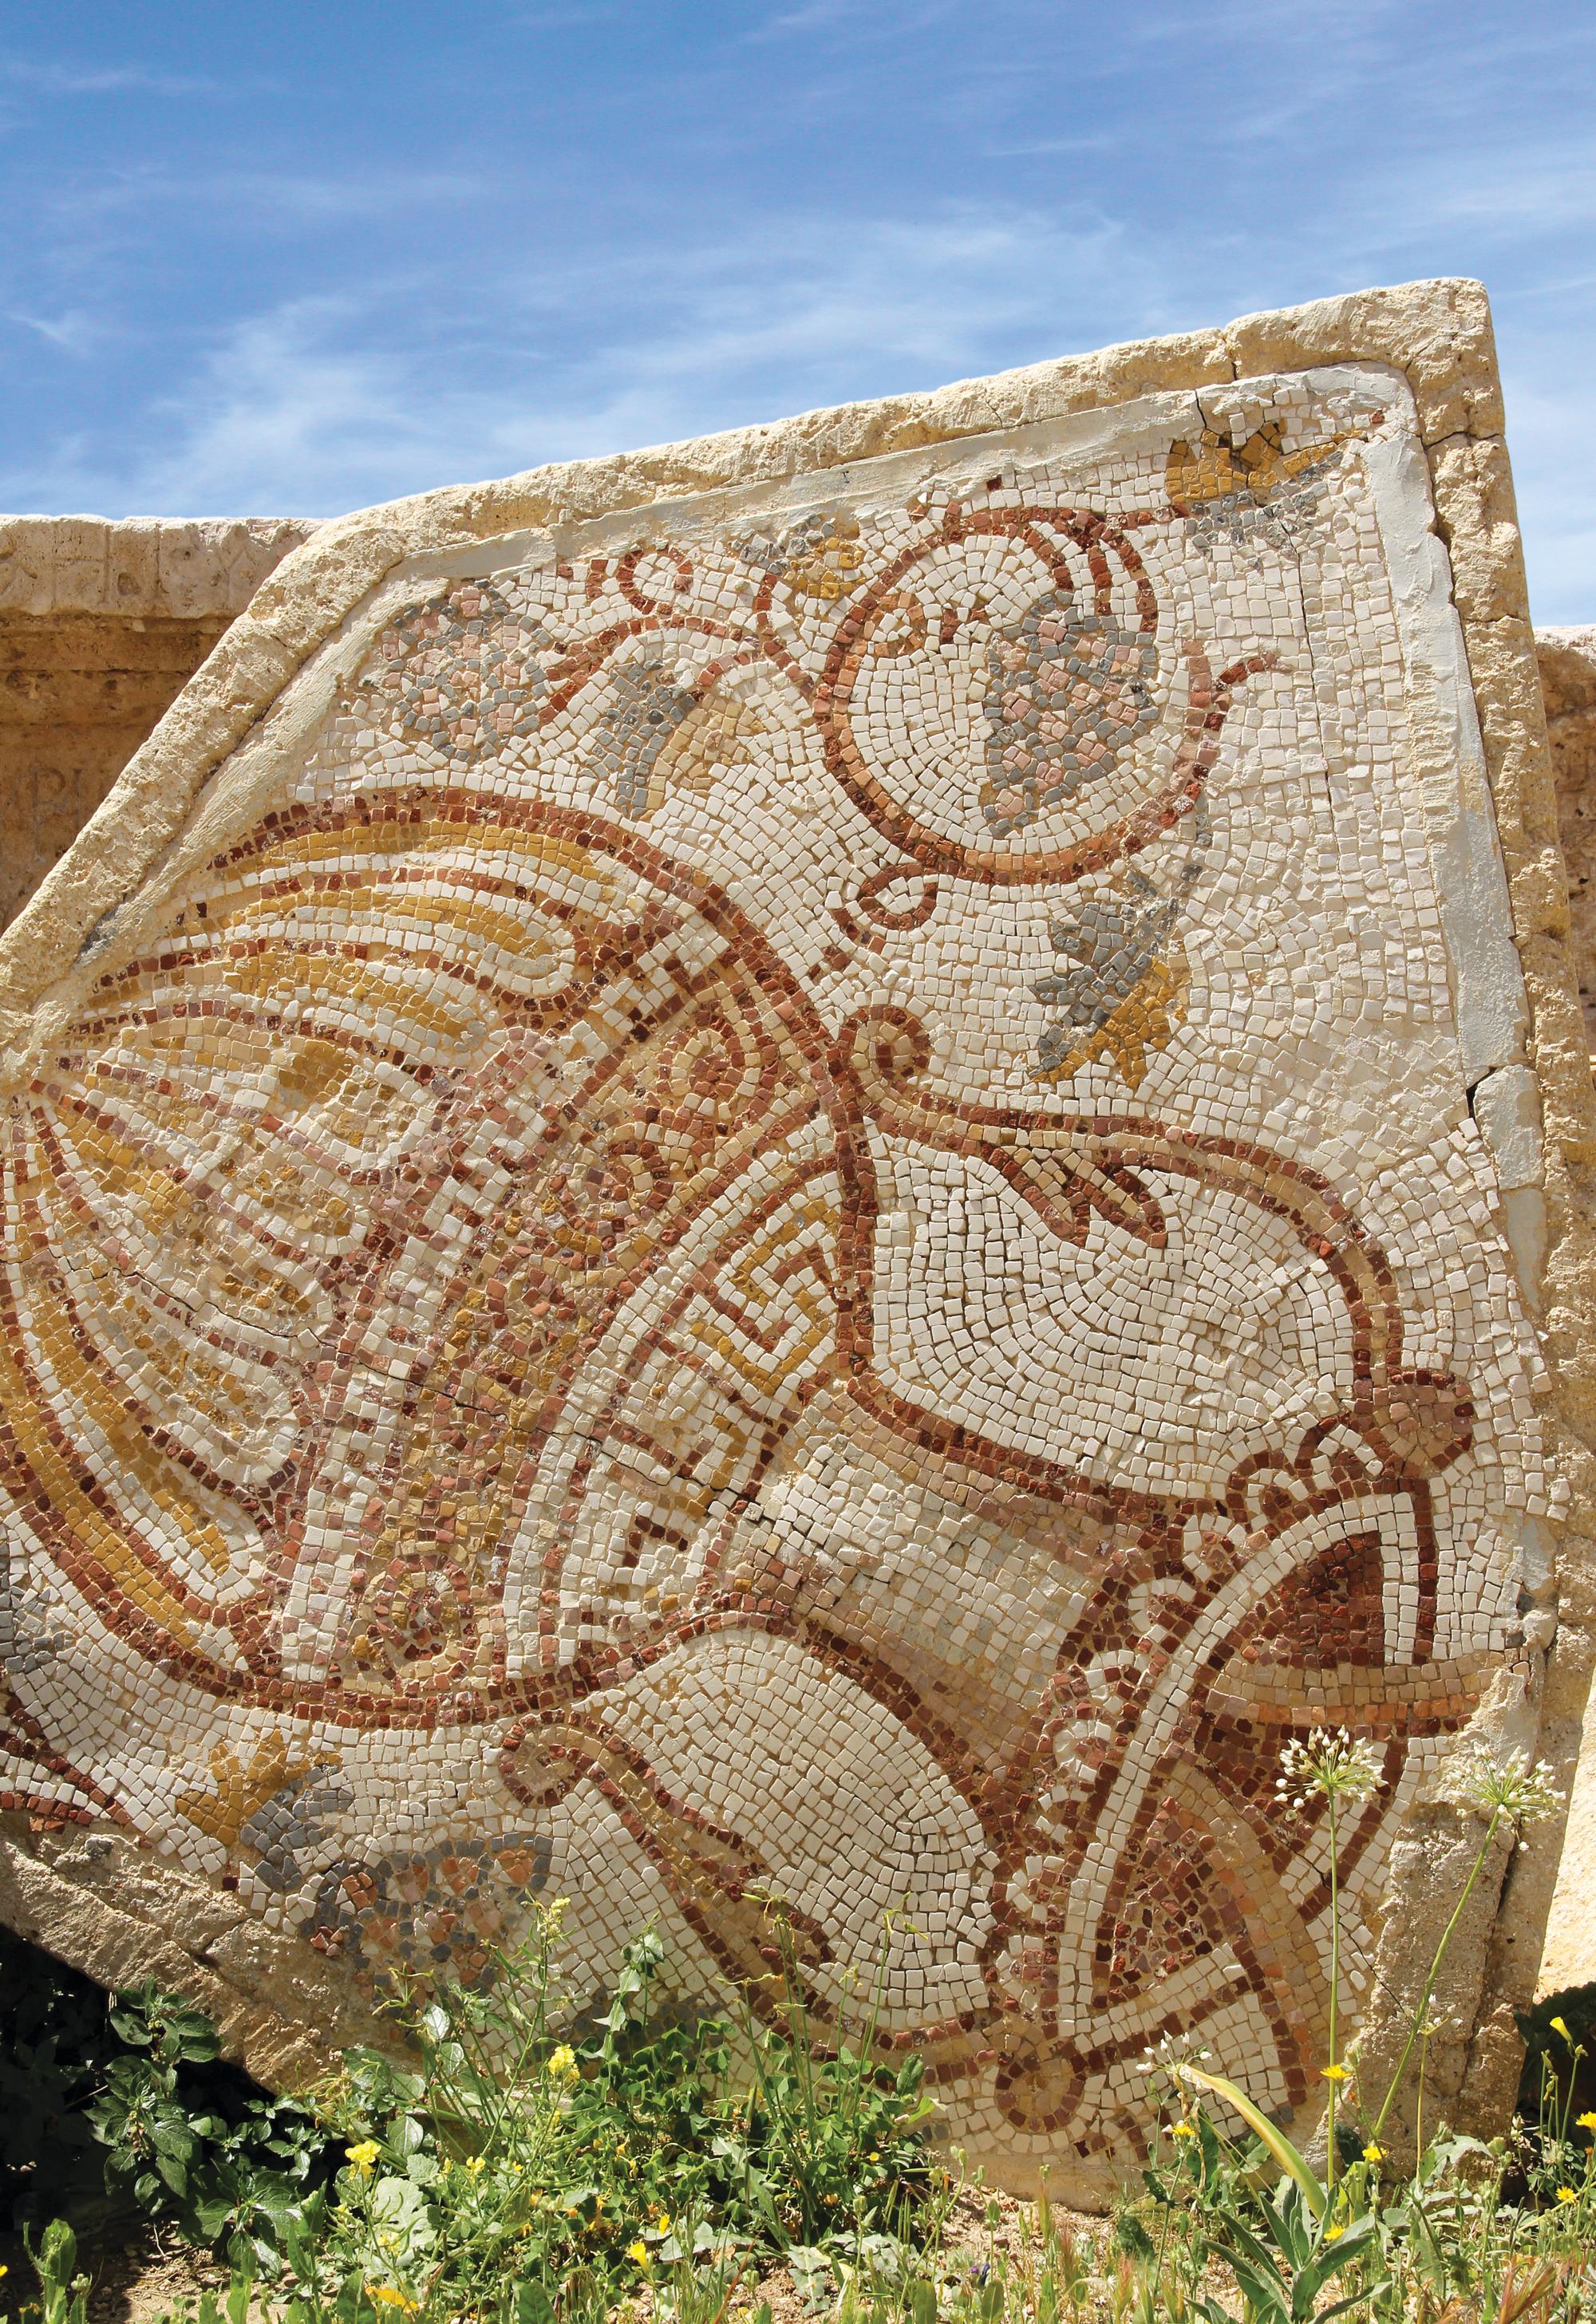 rzymska mozaika | fot. Pixeljoy / shutterstock